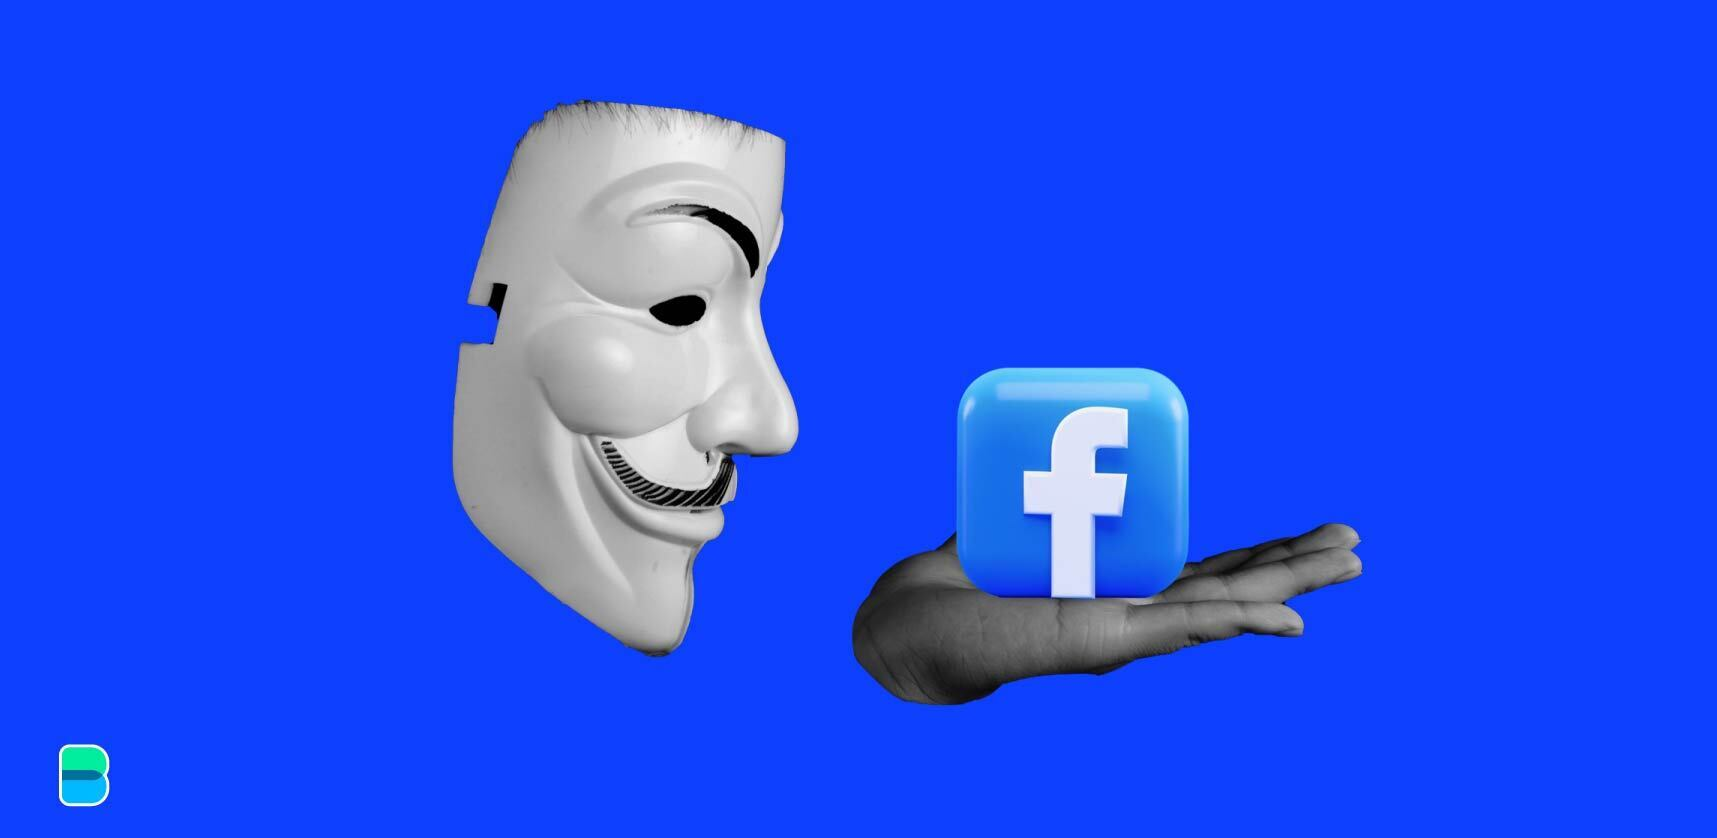 Facebook's getting sloppy